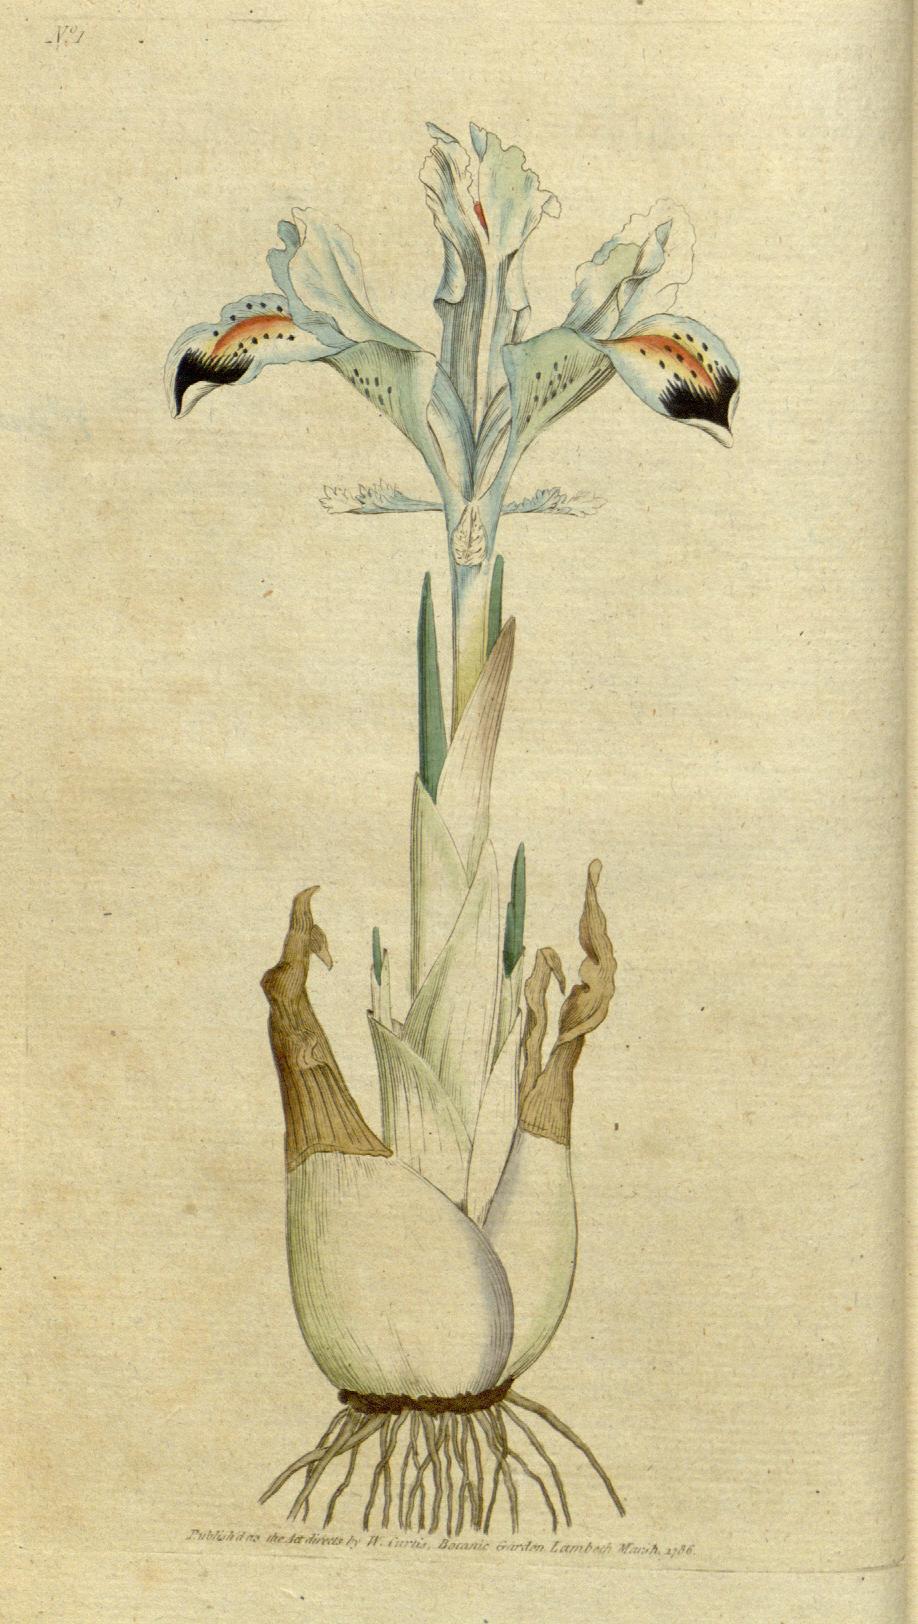 Iris alberti